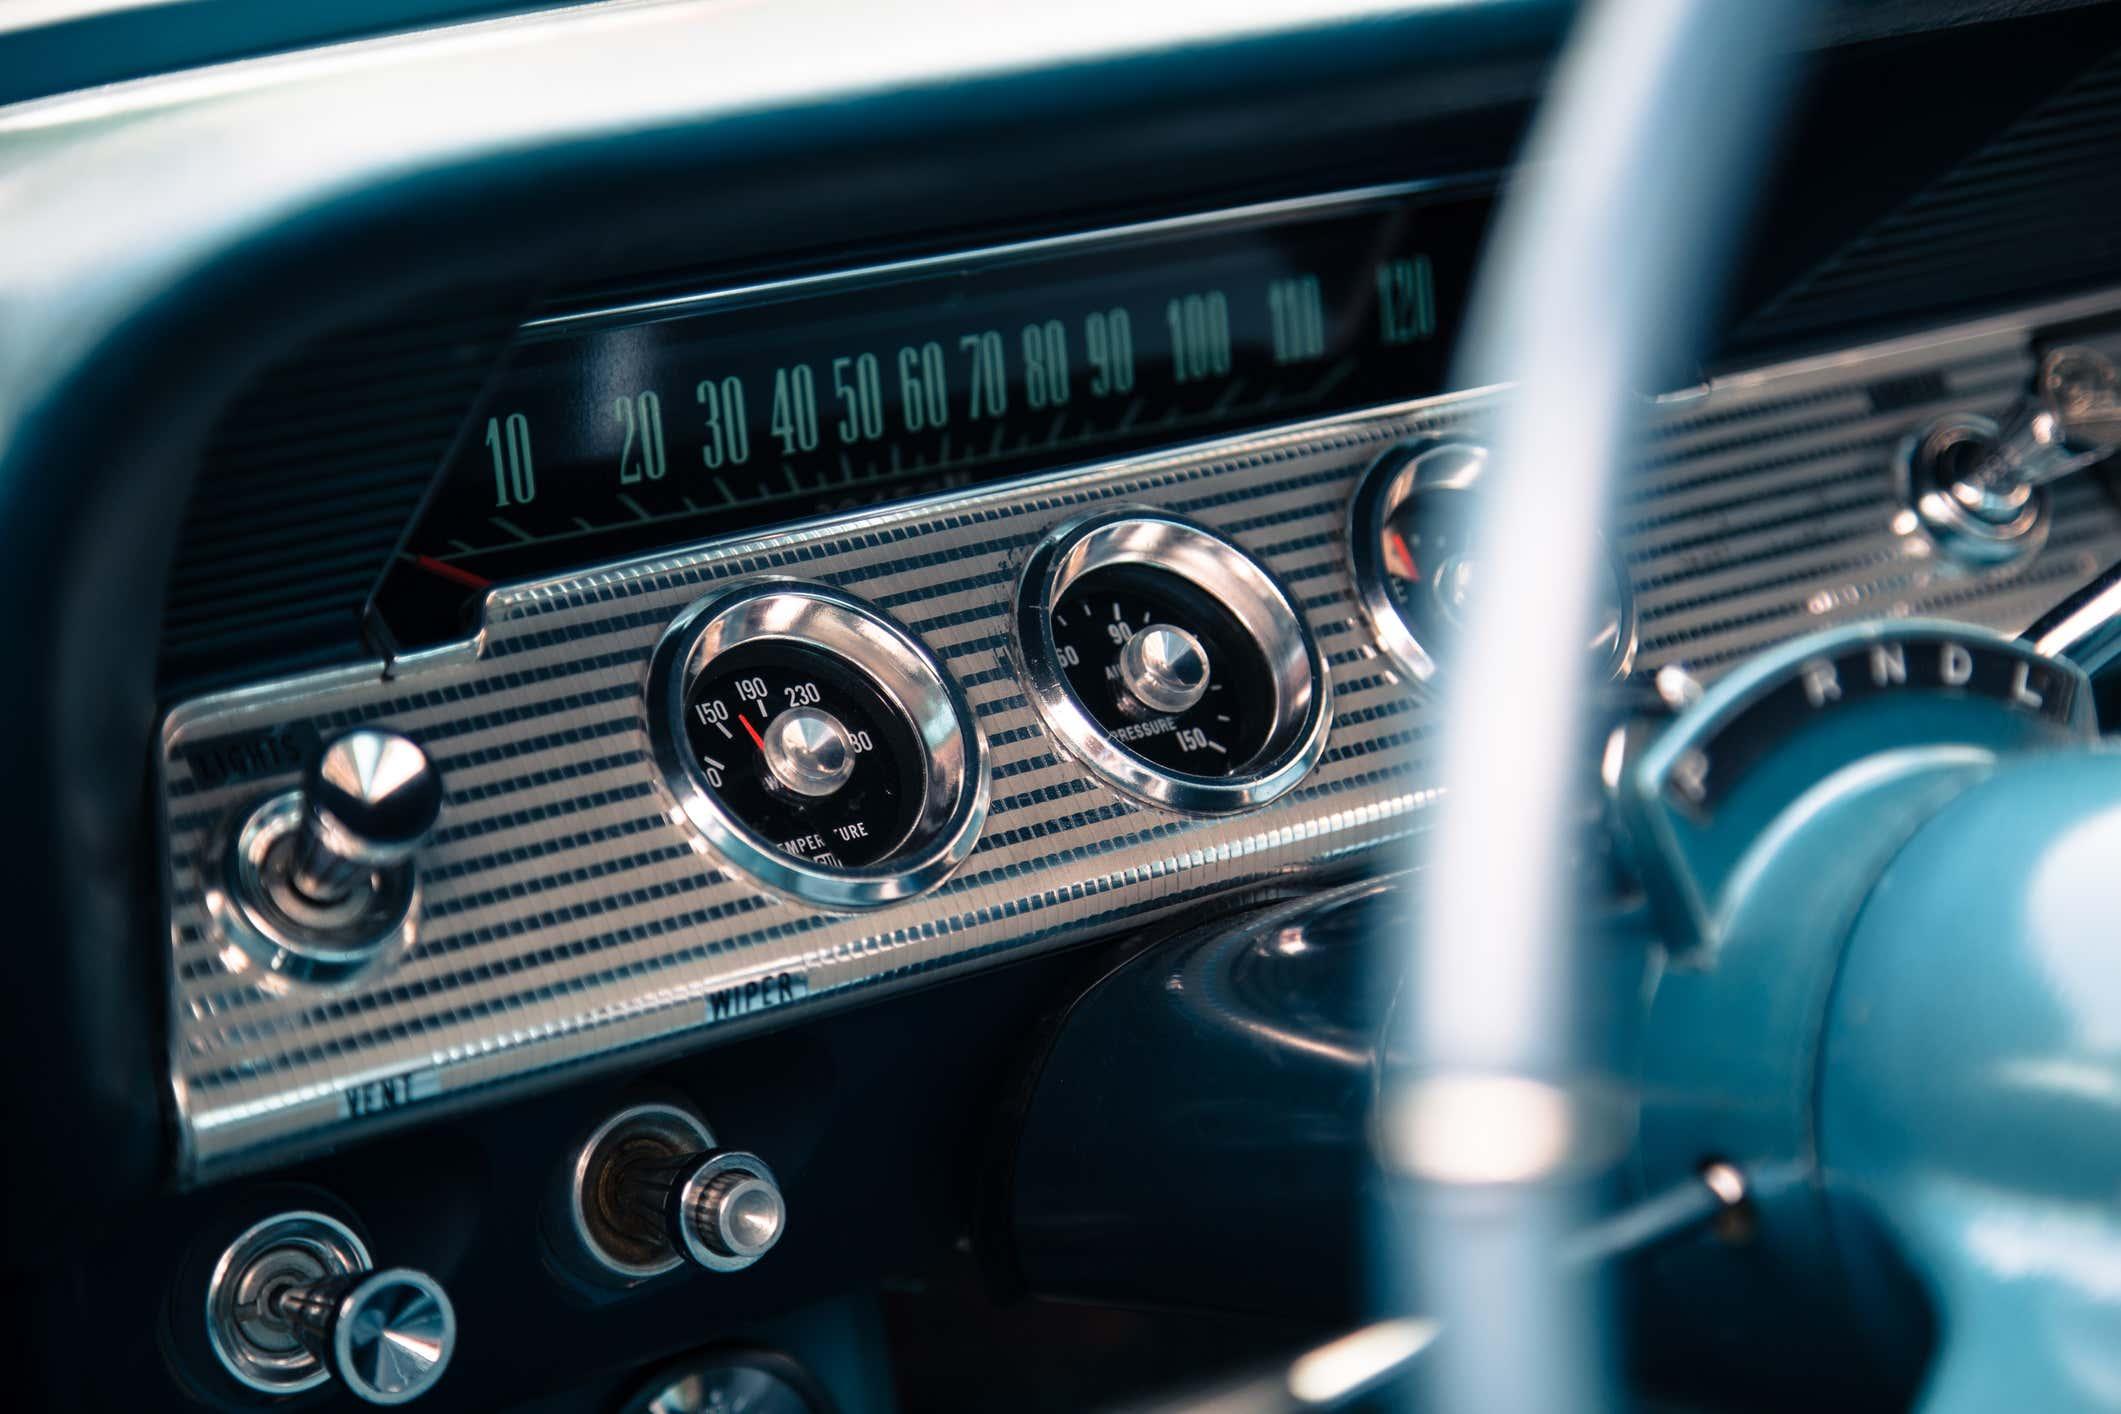 Best Classic Auto Insurance Companies Insure Your Collector From Damagebest Classic Auto Insurance Companies Insure Your Collector From Damage